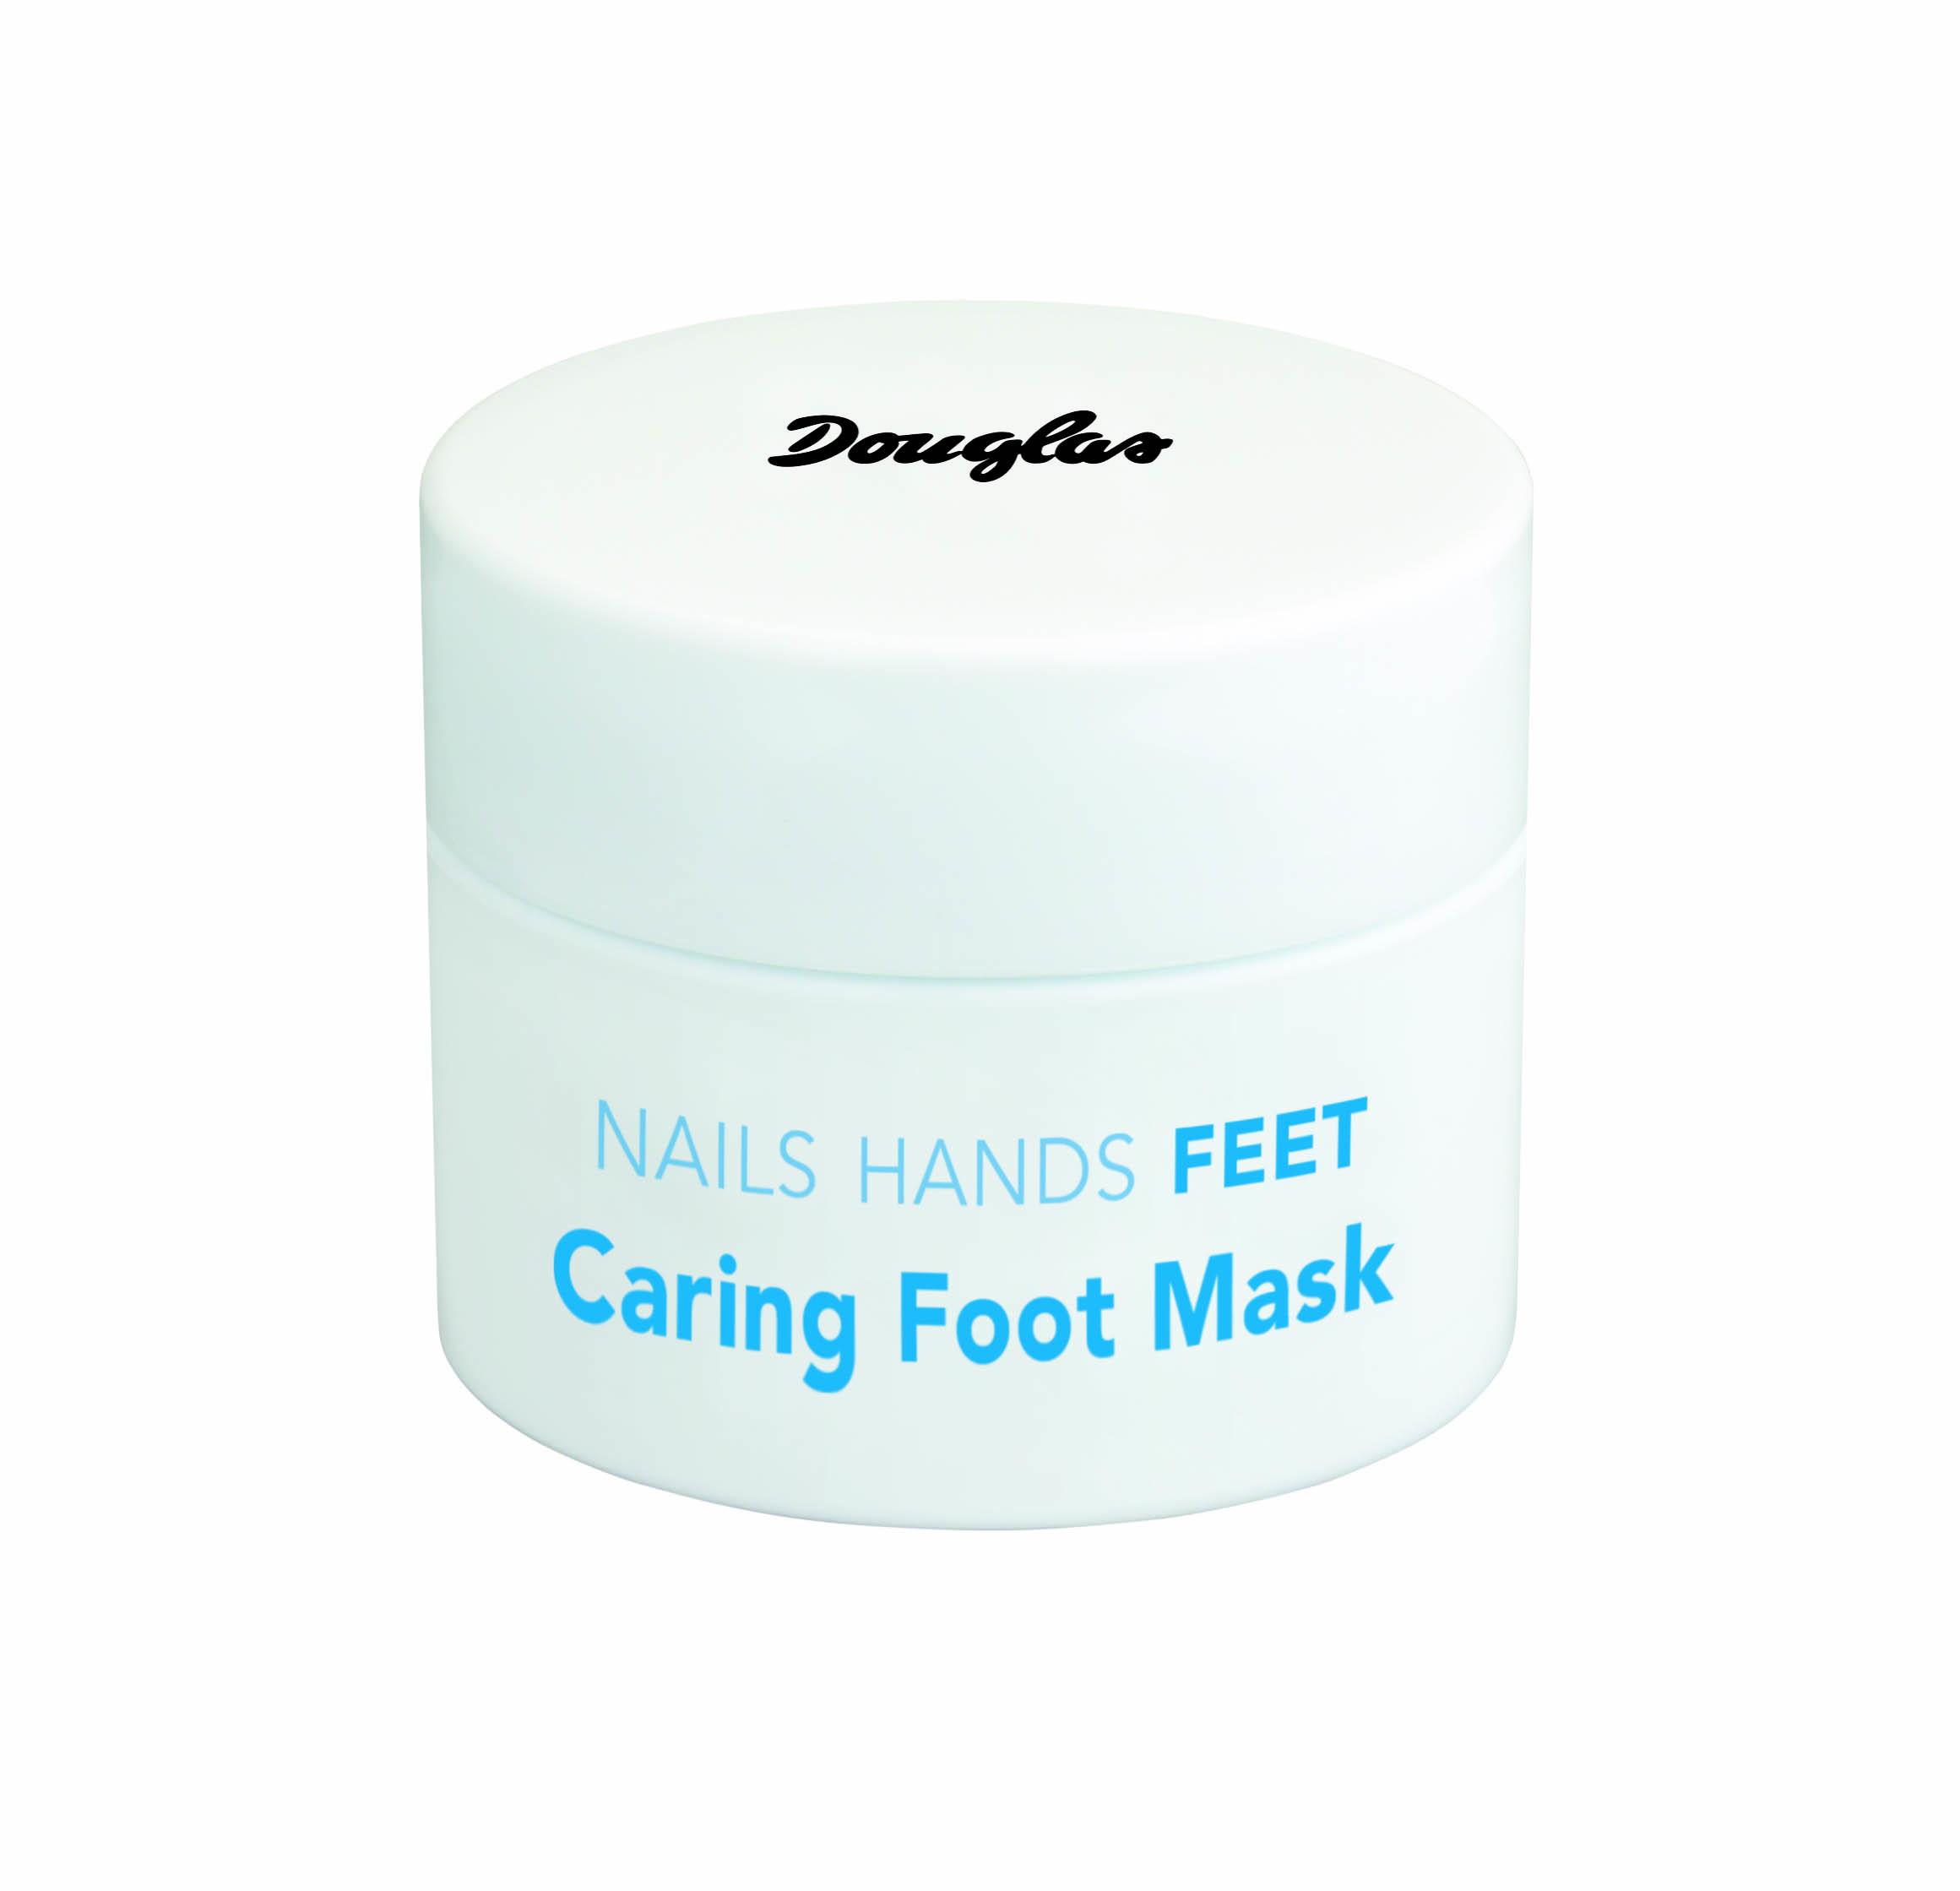 NHF Caring Foot Mask, Douglas